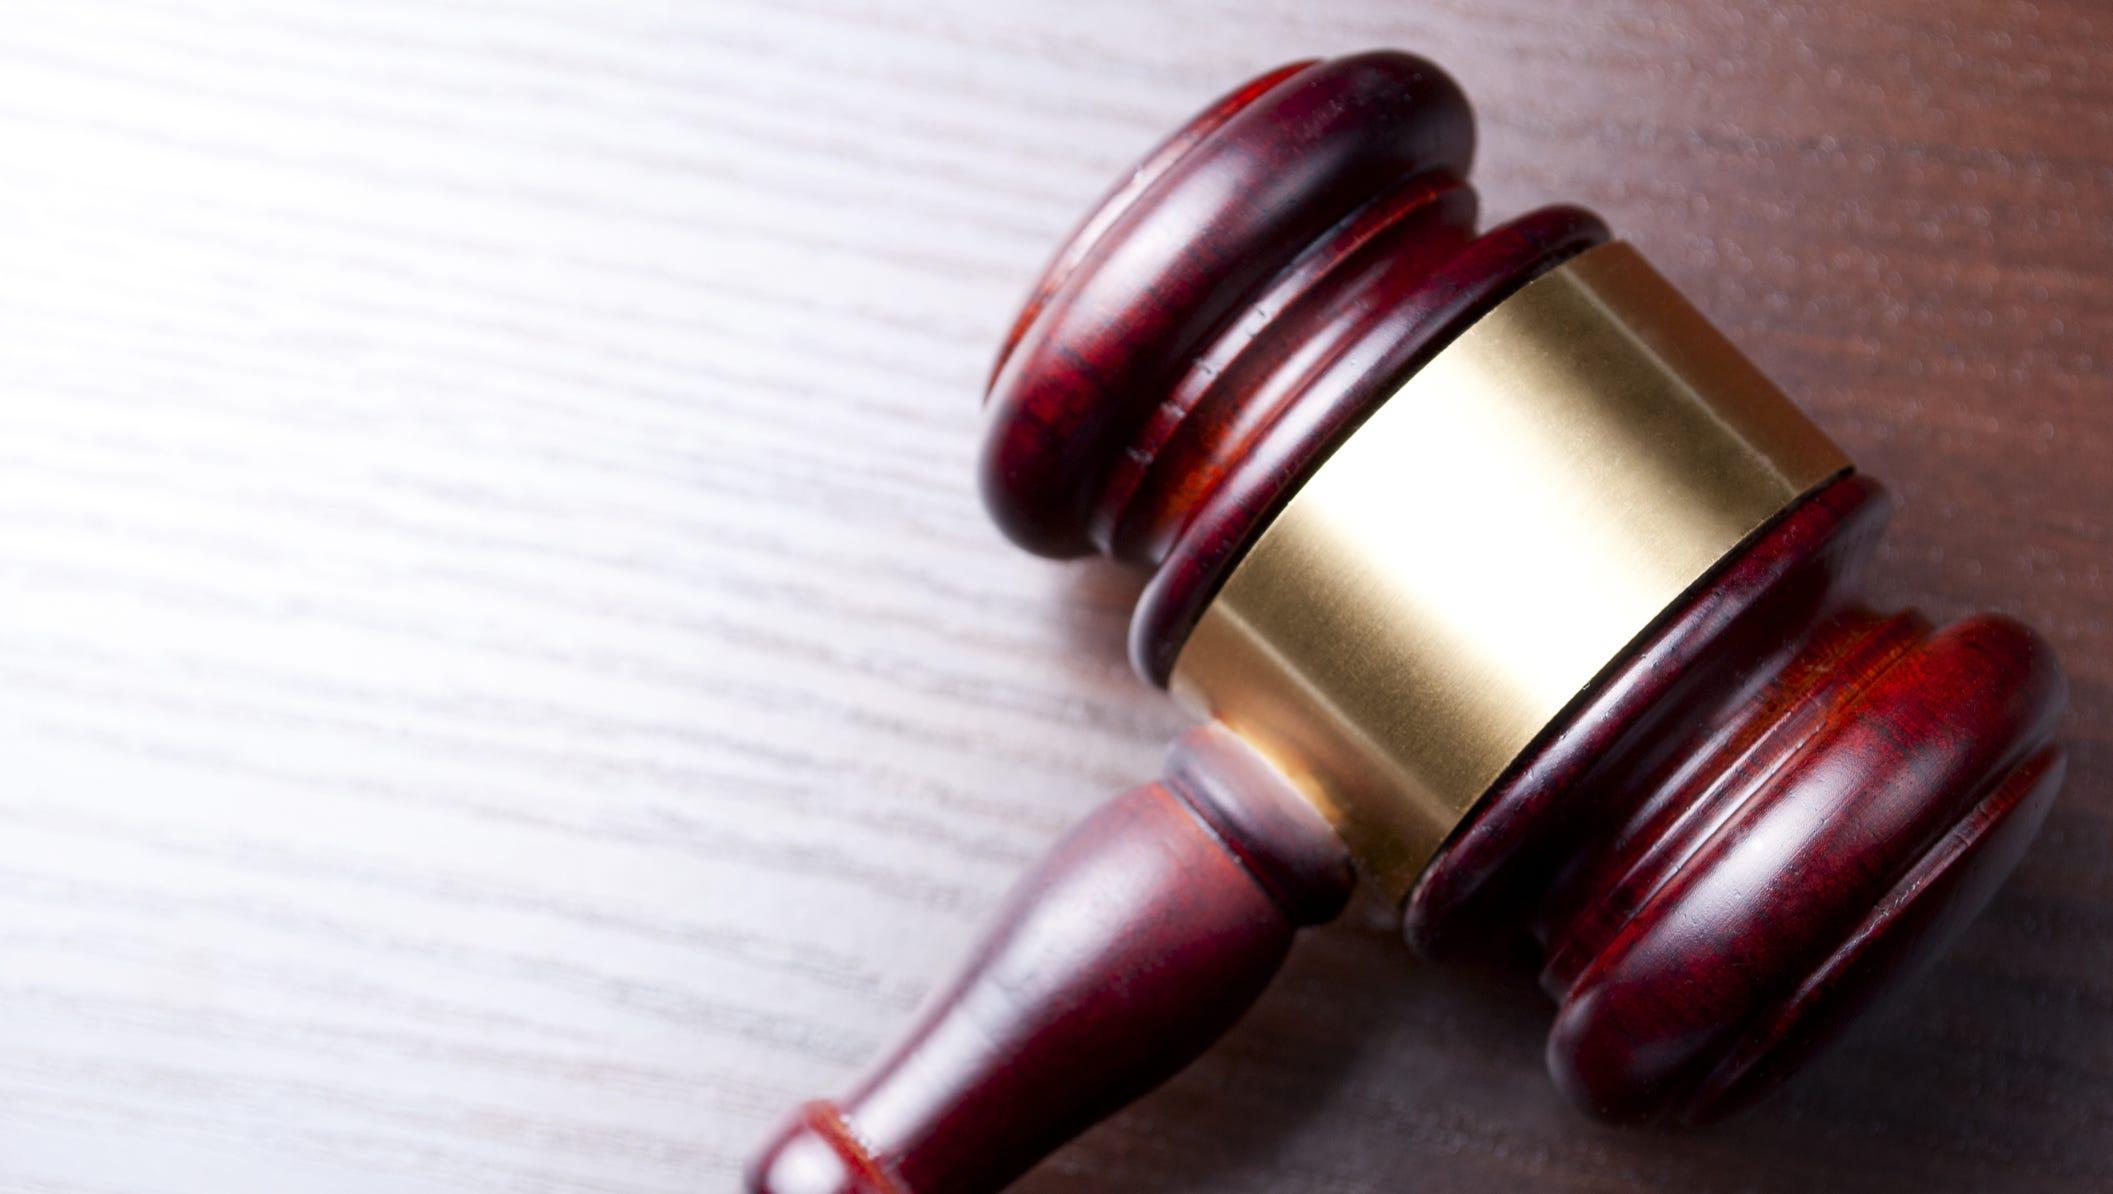 Westfield man guilty of money laundering sentenced